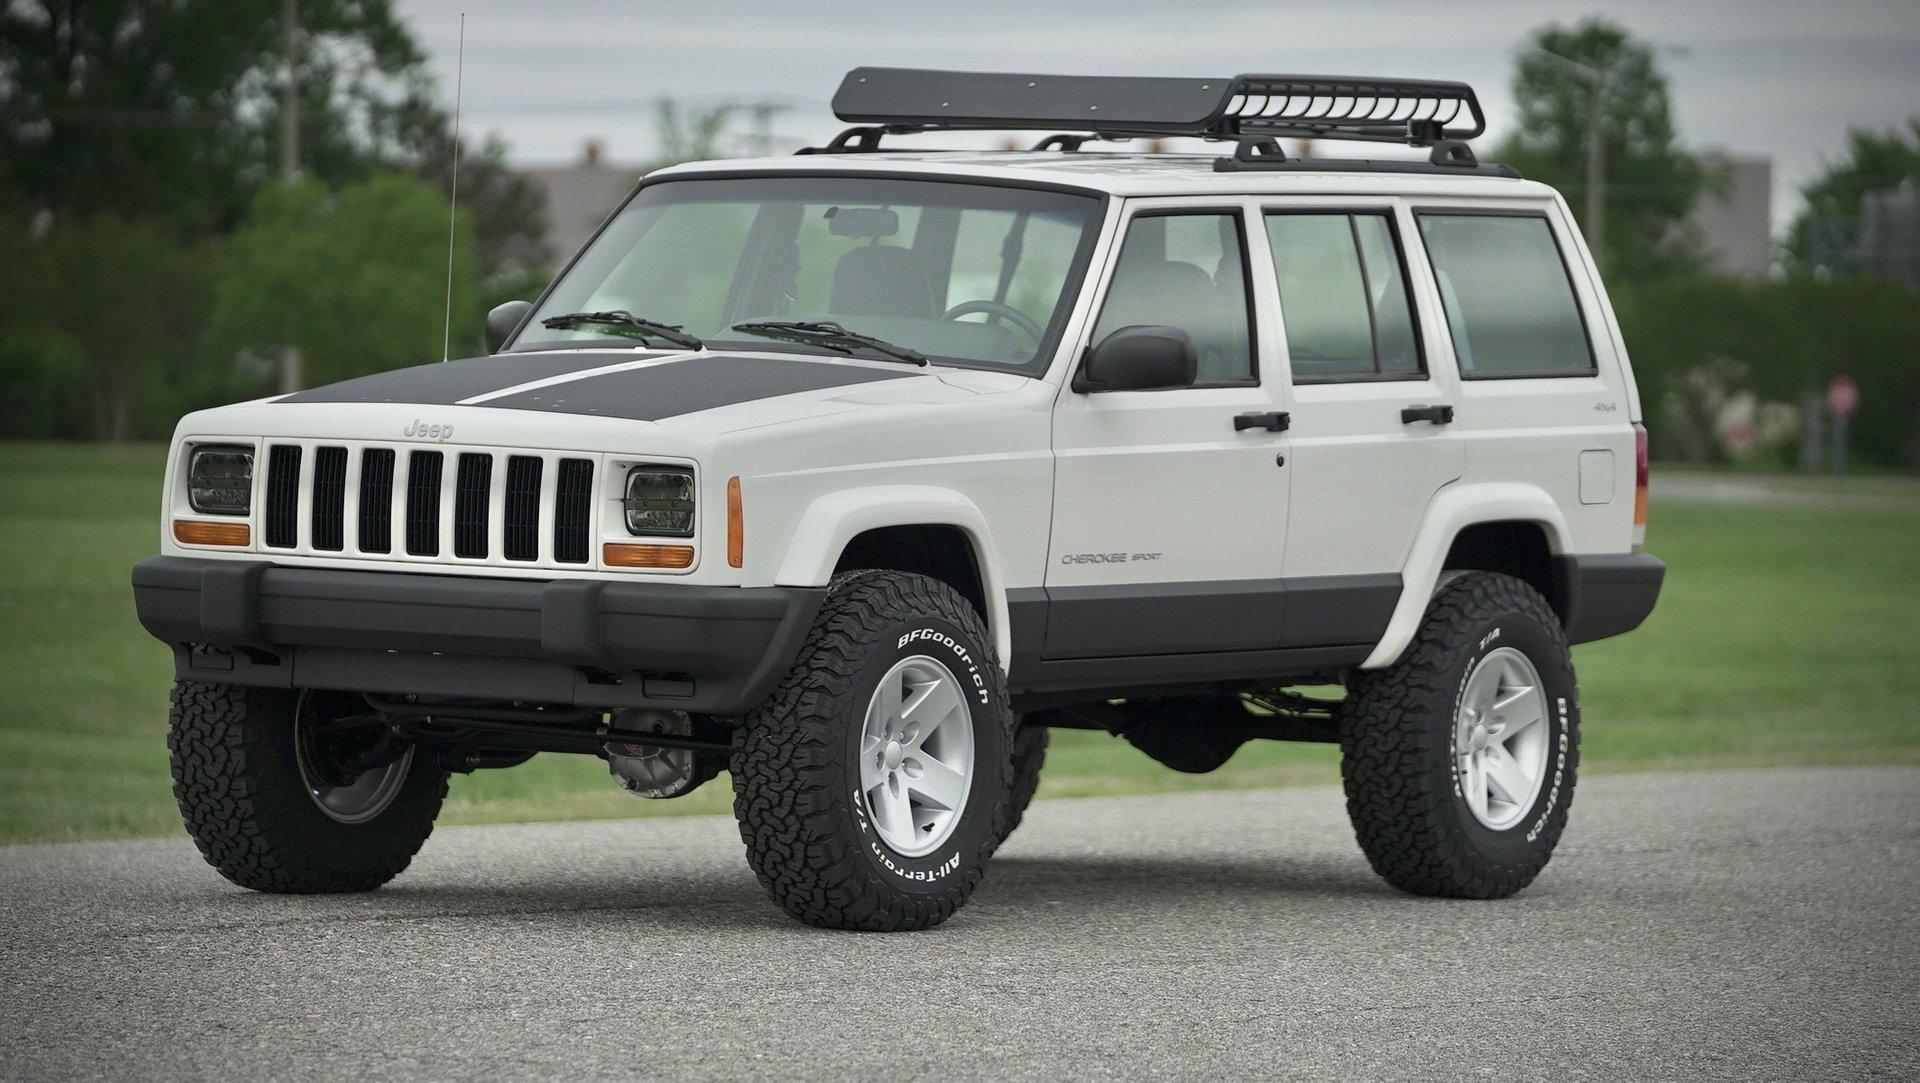 2001 jeep cherokee das stage 2 cherokee xj